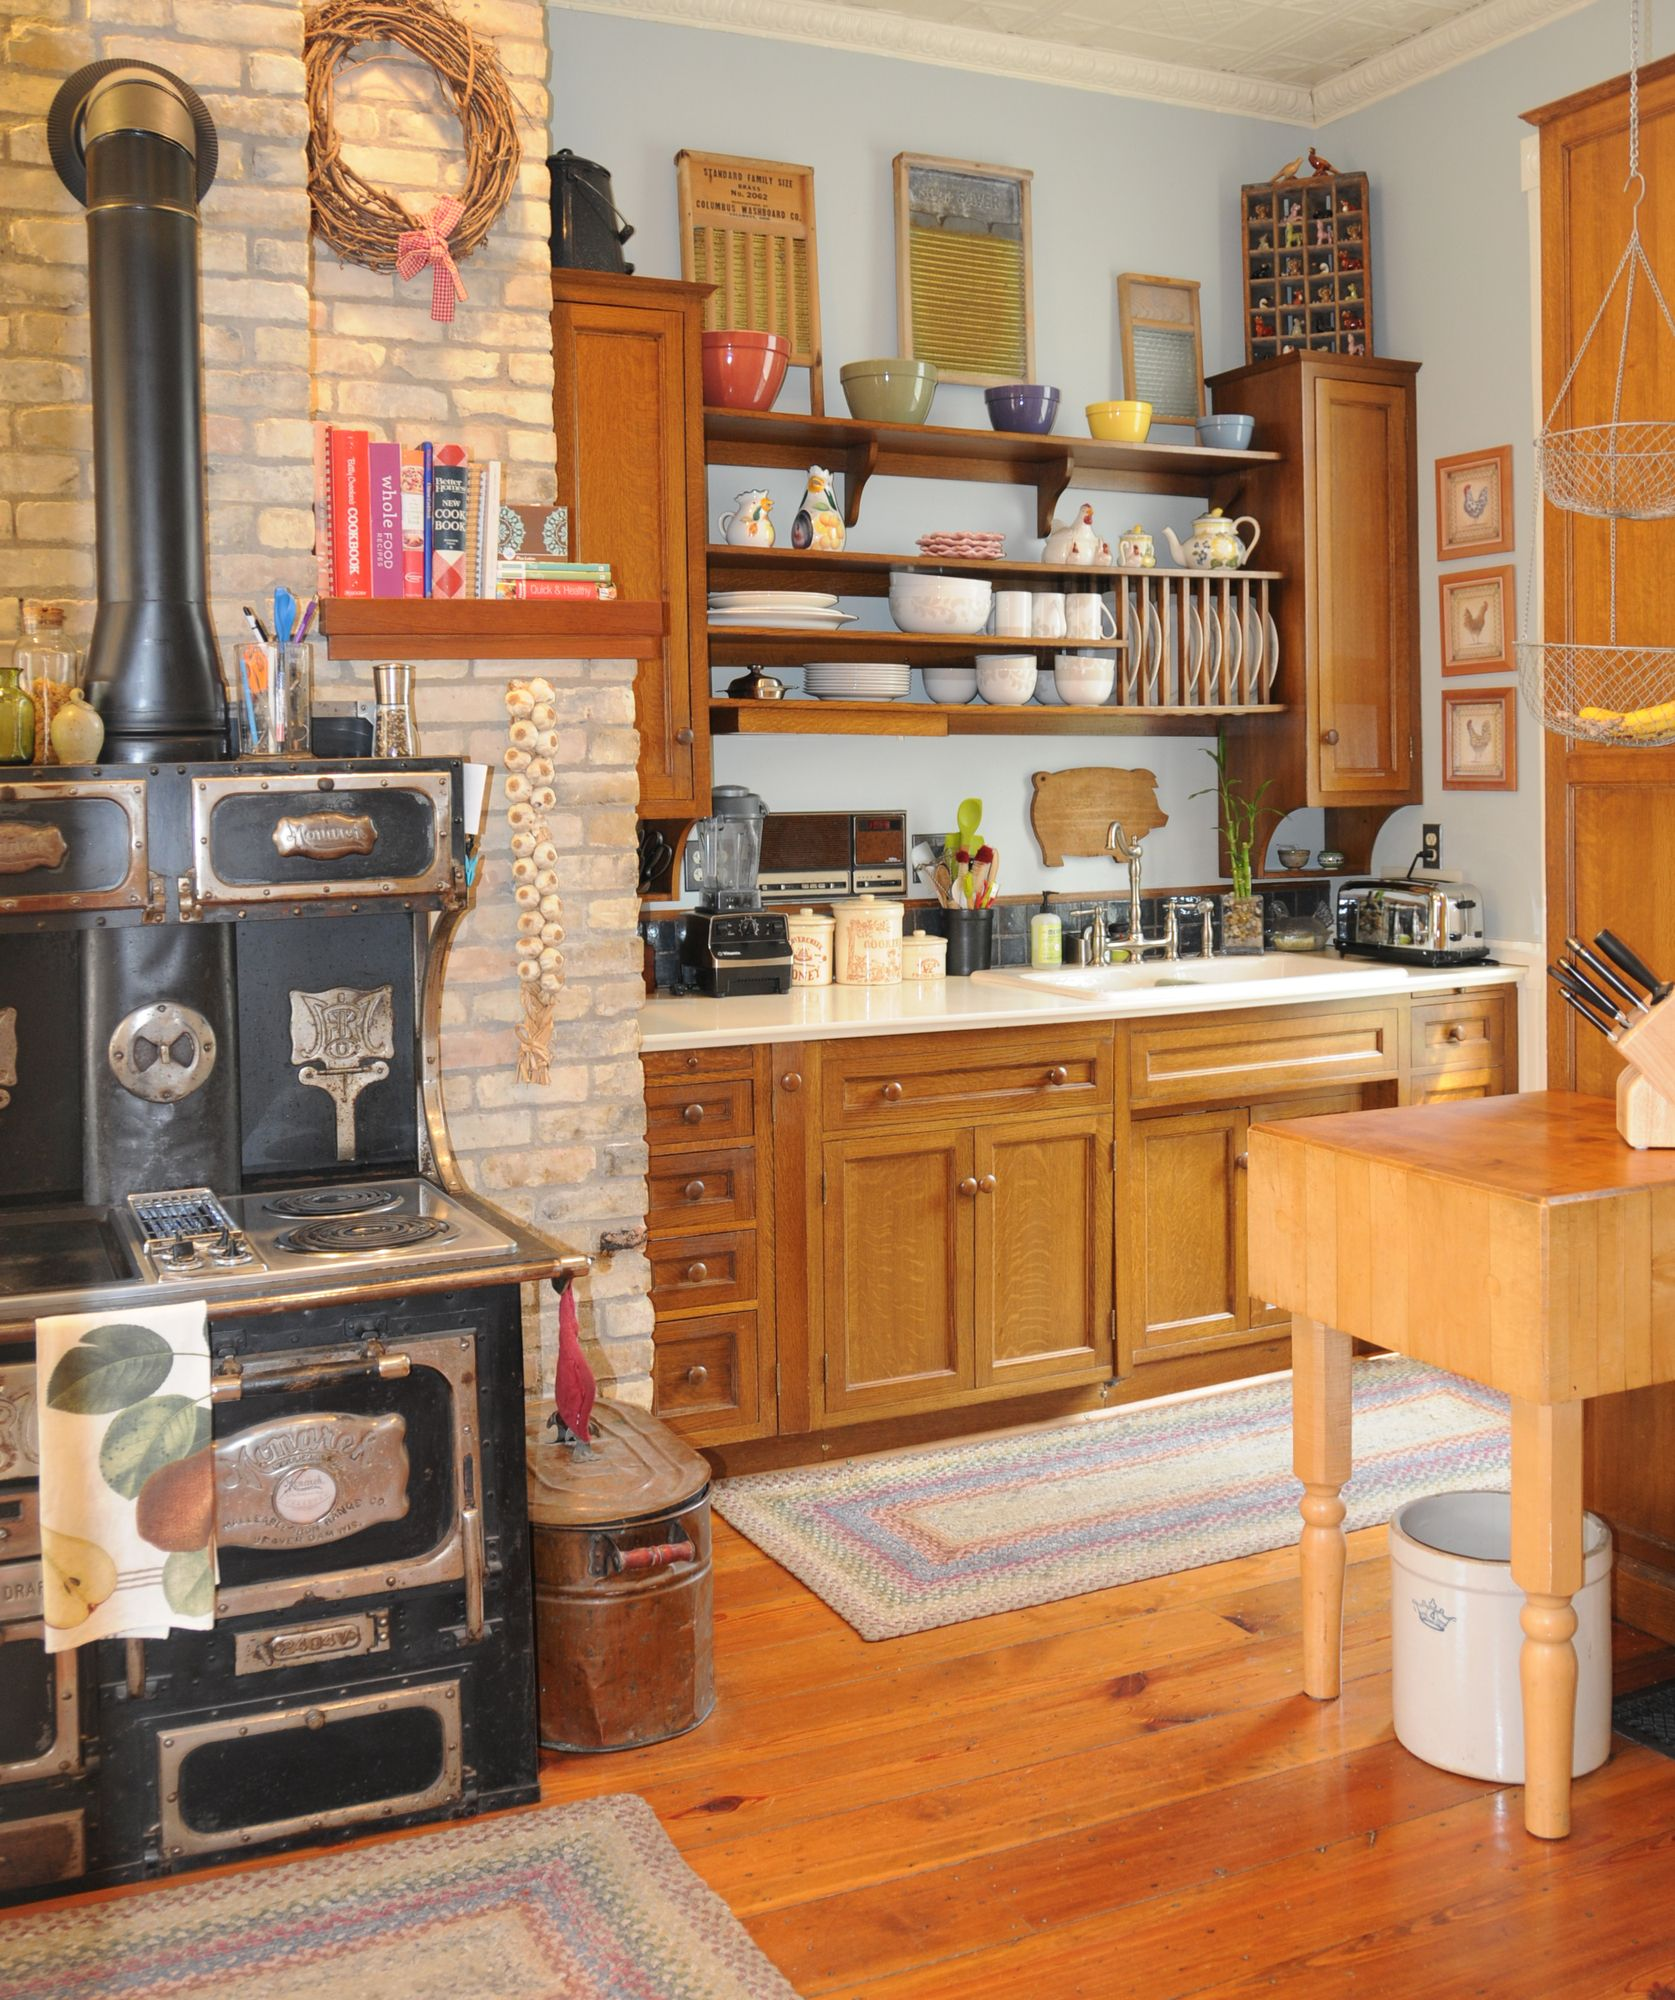 Antique Kitchen 1880s Home Design Decor Victorian